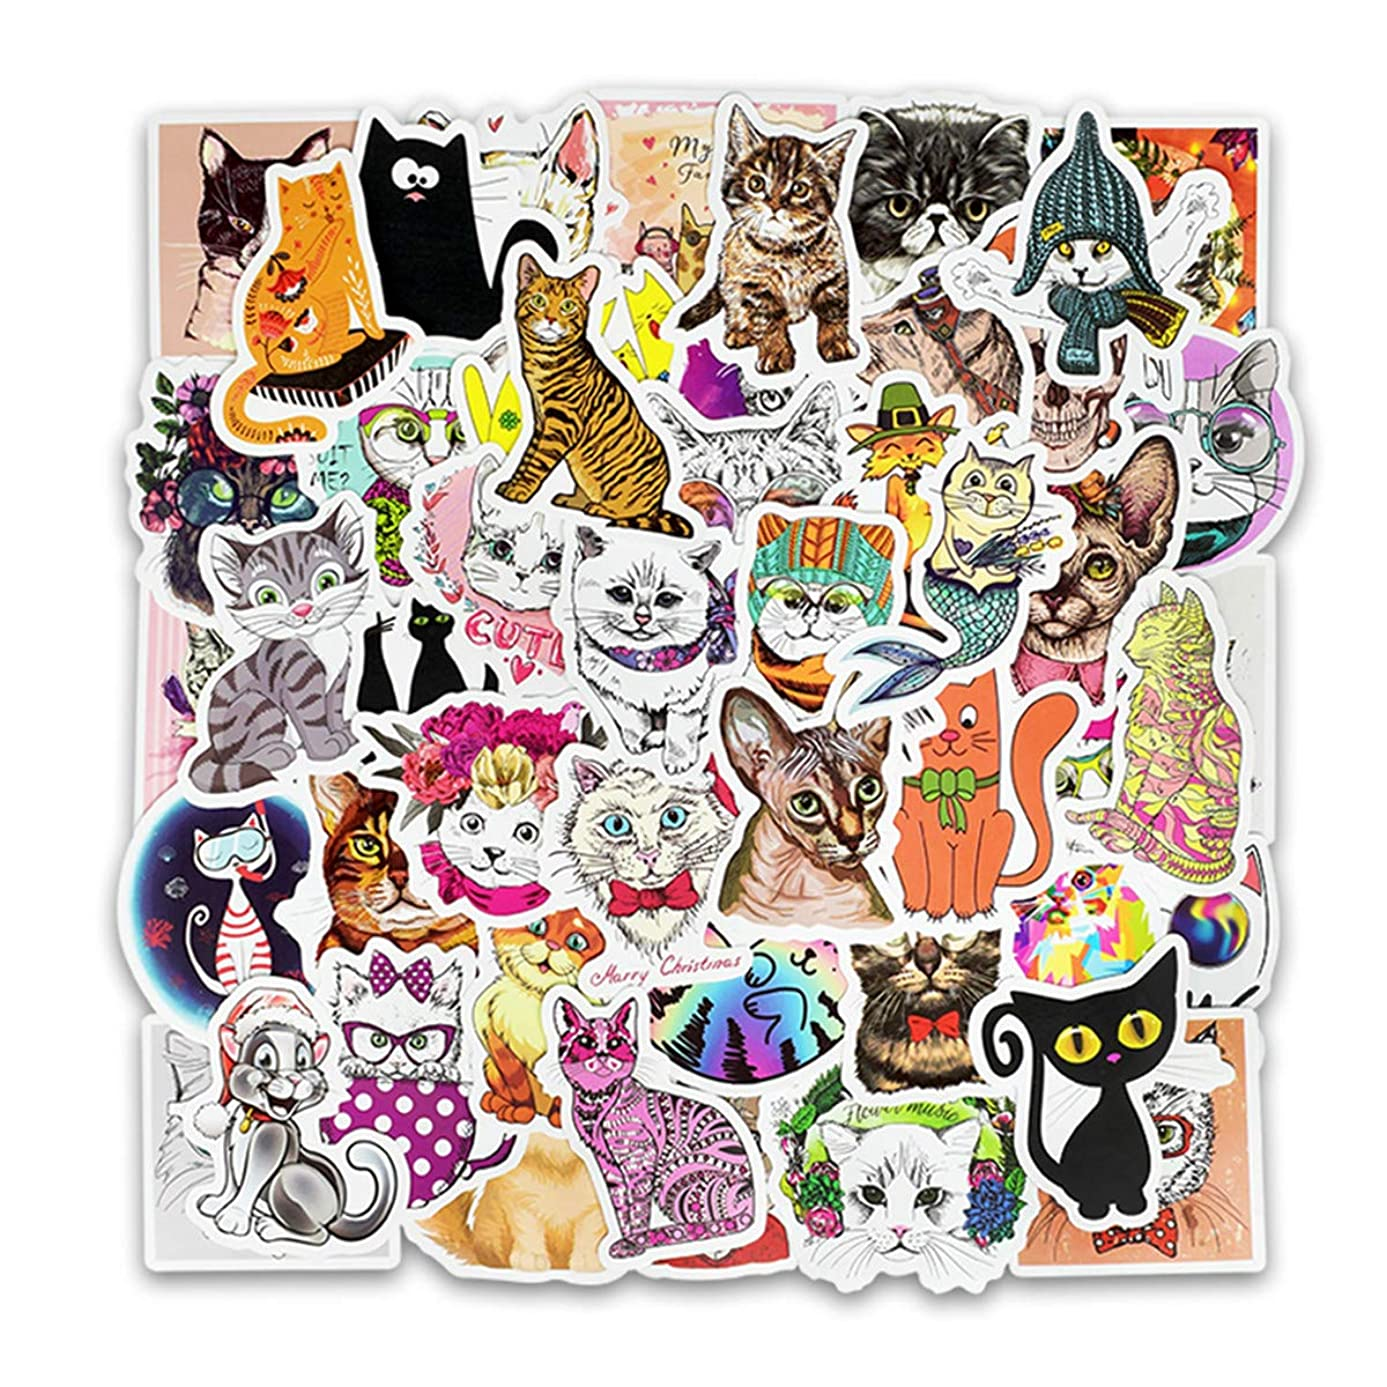 50pcs Cool Animals Cute Funny Cat Emoji Sticker for Laptop Phone Computer PC Water Bottle Bike Helmet Car Motorcycle Bumper Luggage Helmet Skateboard Snowboard Waterproof Graffiti Hippie Decals (Cat)